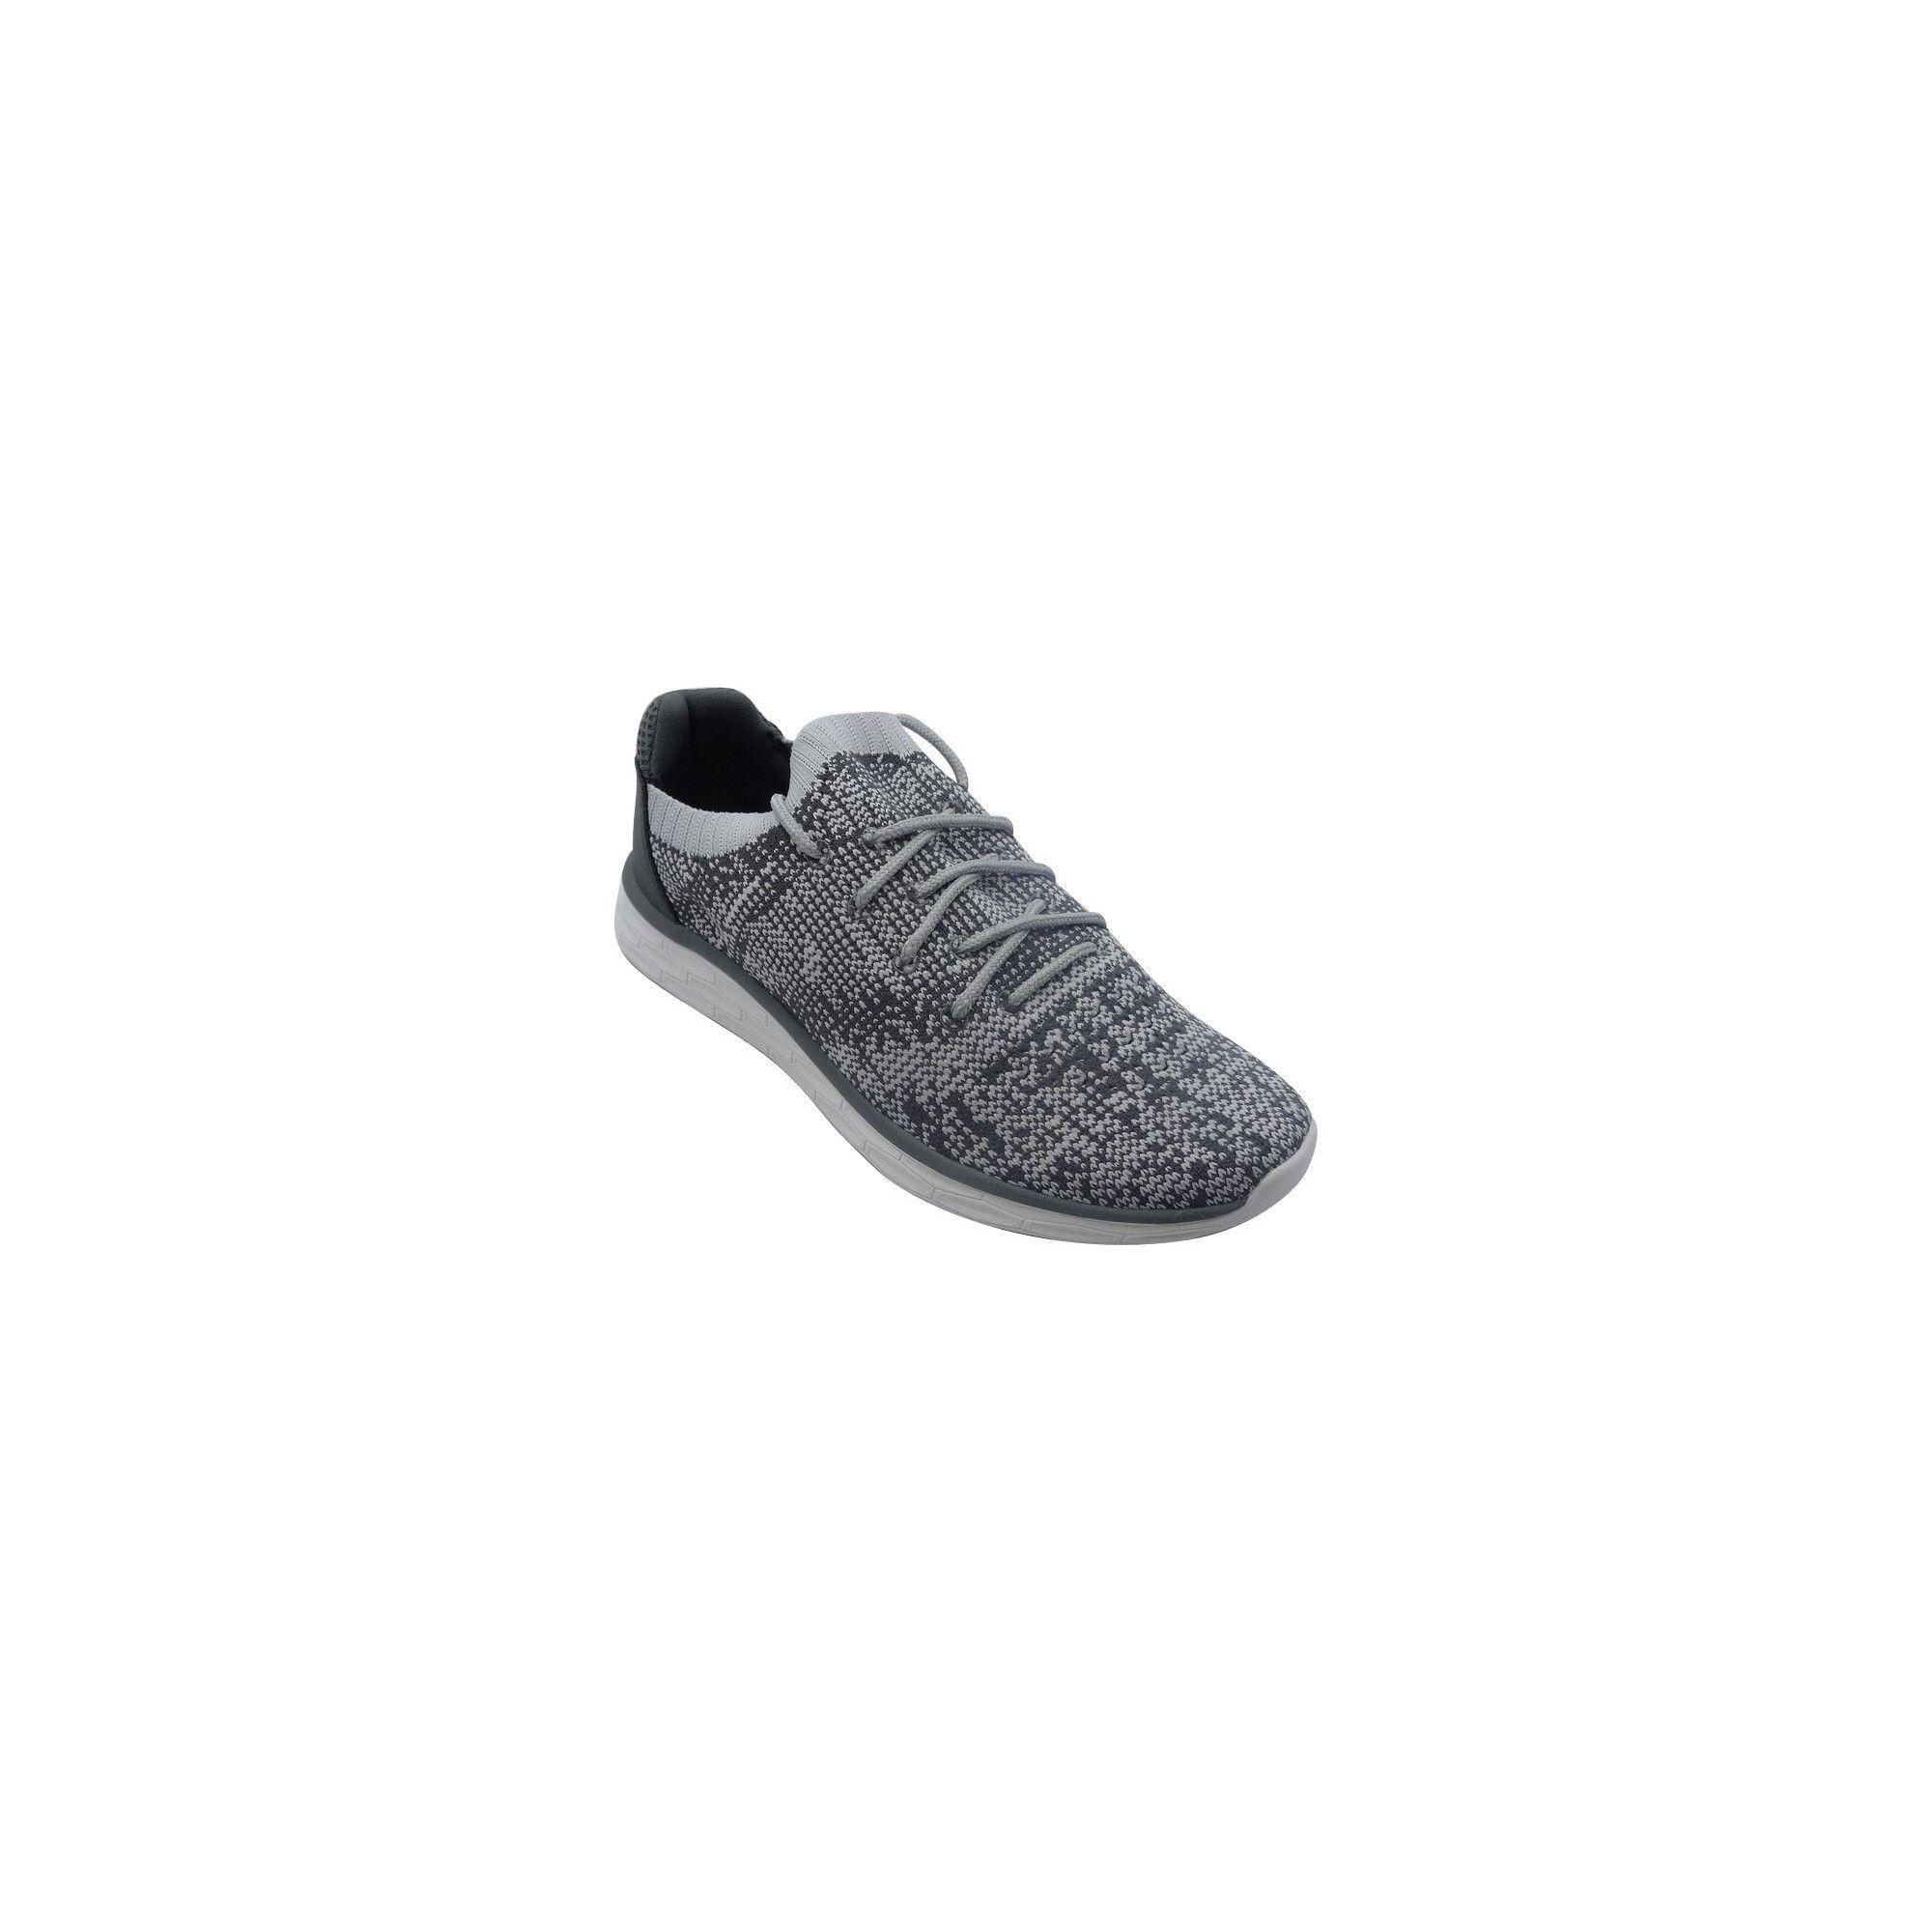 Women s Strike Performance Athletic Shoes 5.5 - C9 Champion Gray ... b8a813955